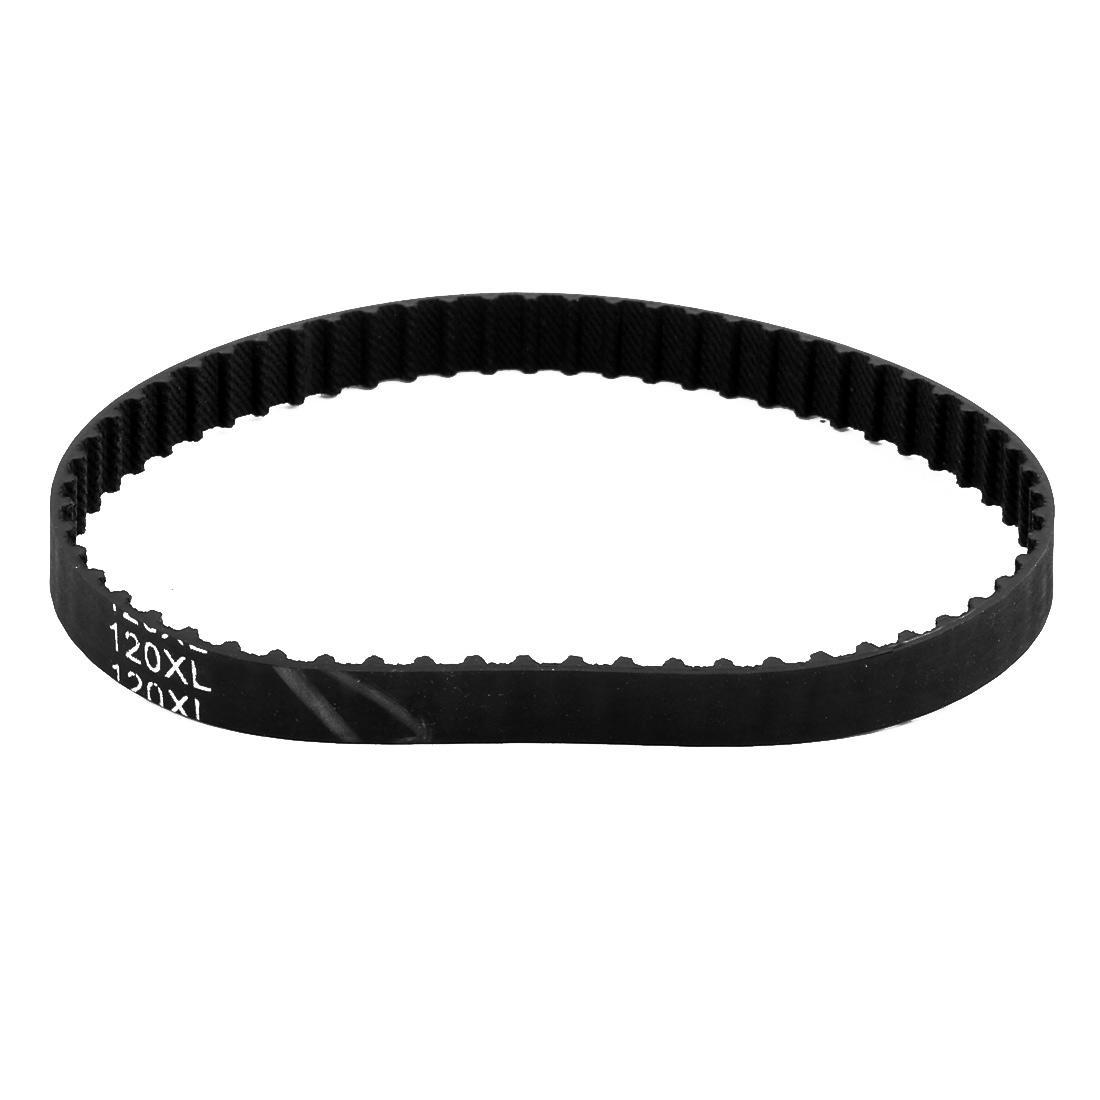 120XL 60 Teeth 10mm Width 5.08mm Pitch Stepper Motor Rubber Timing Belt Black